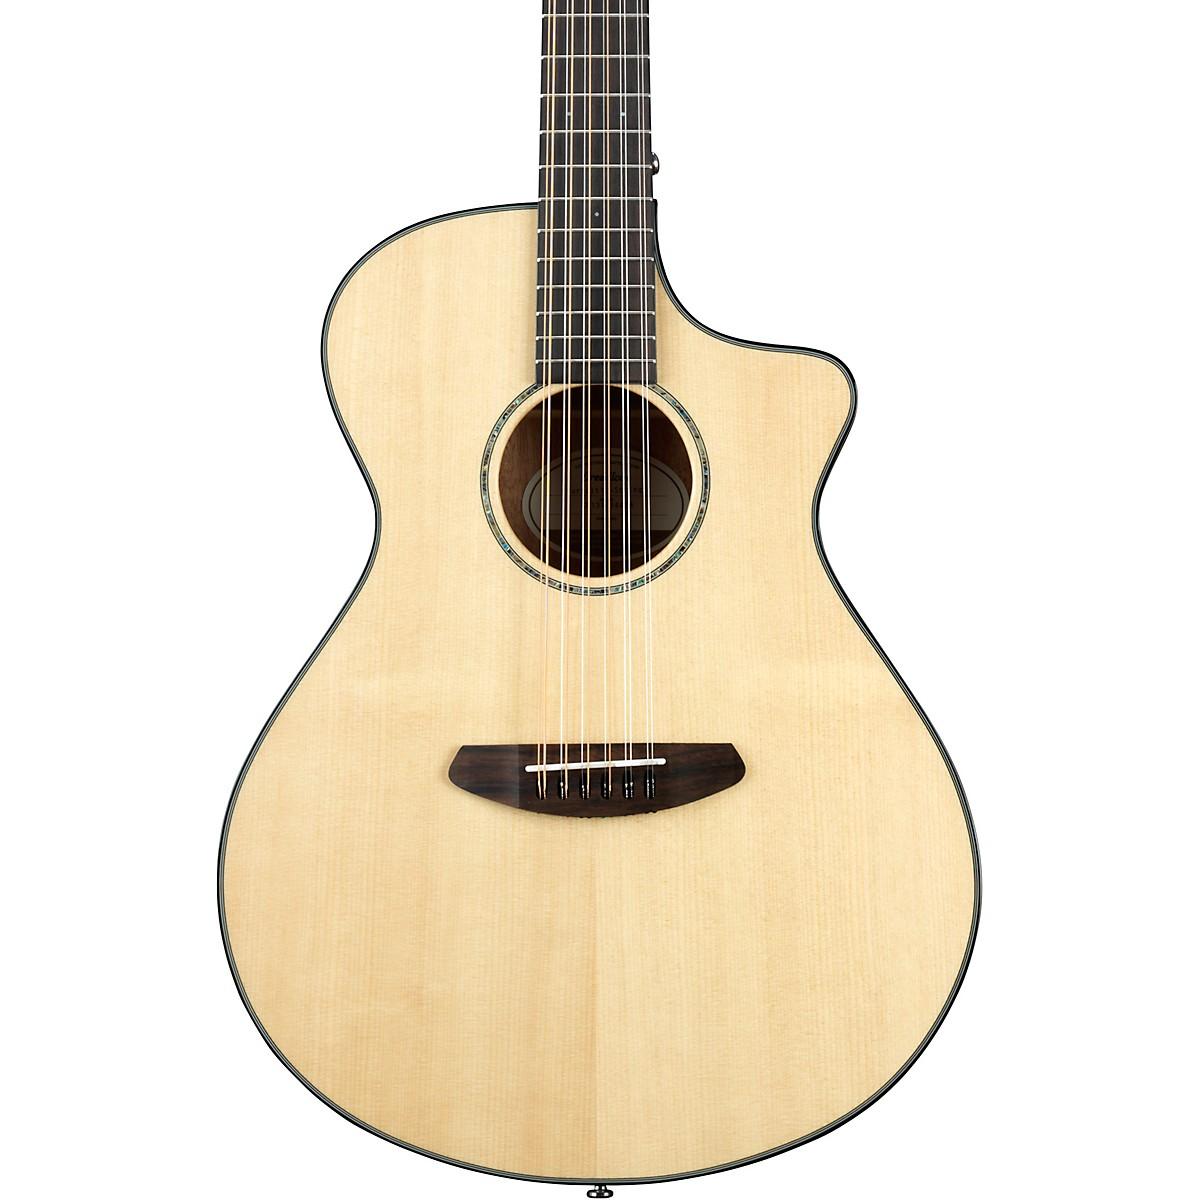 Breedlove Pursuit 12-String Concert Cutaway CE Acoustic-Electric Guitar